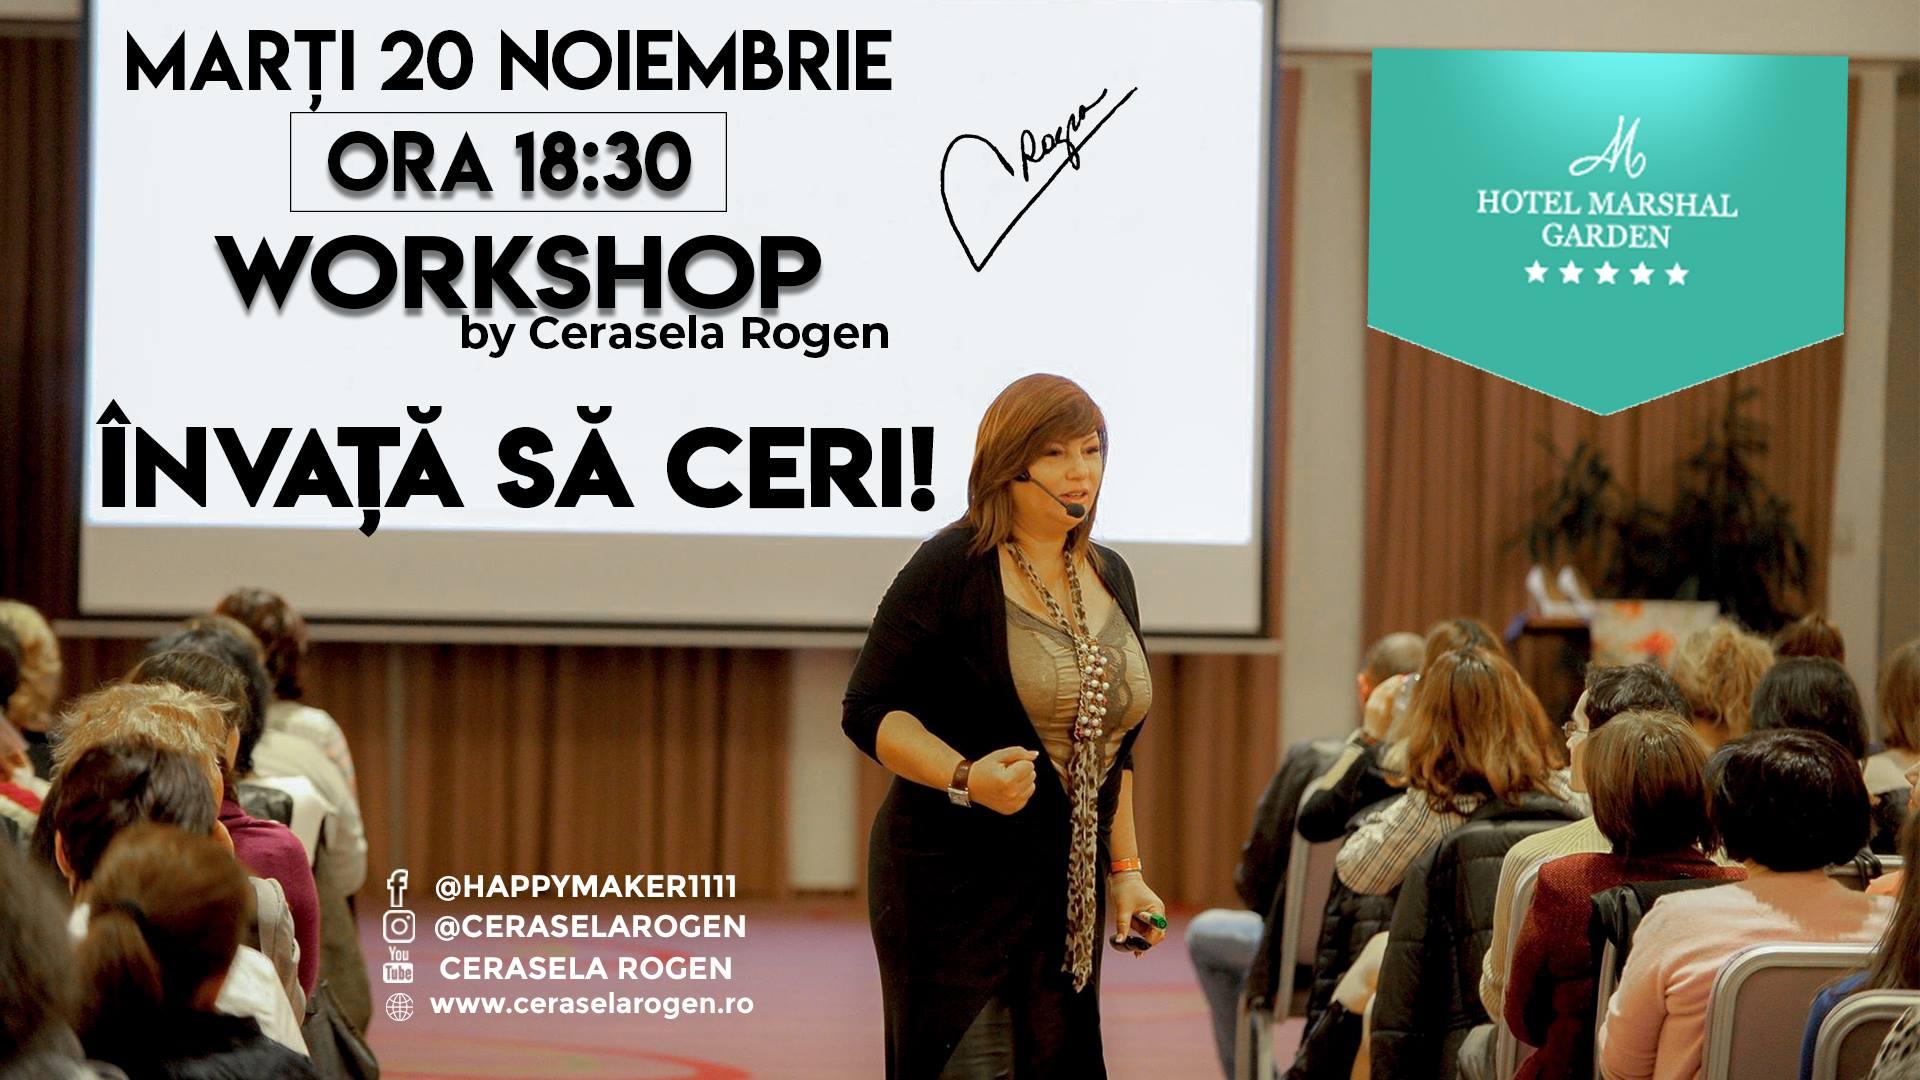 Invata sa CERI! | Workshop by Cerasela Rogen  20 noiembrie, Bucuresti